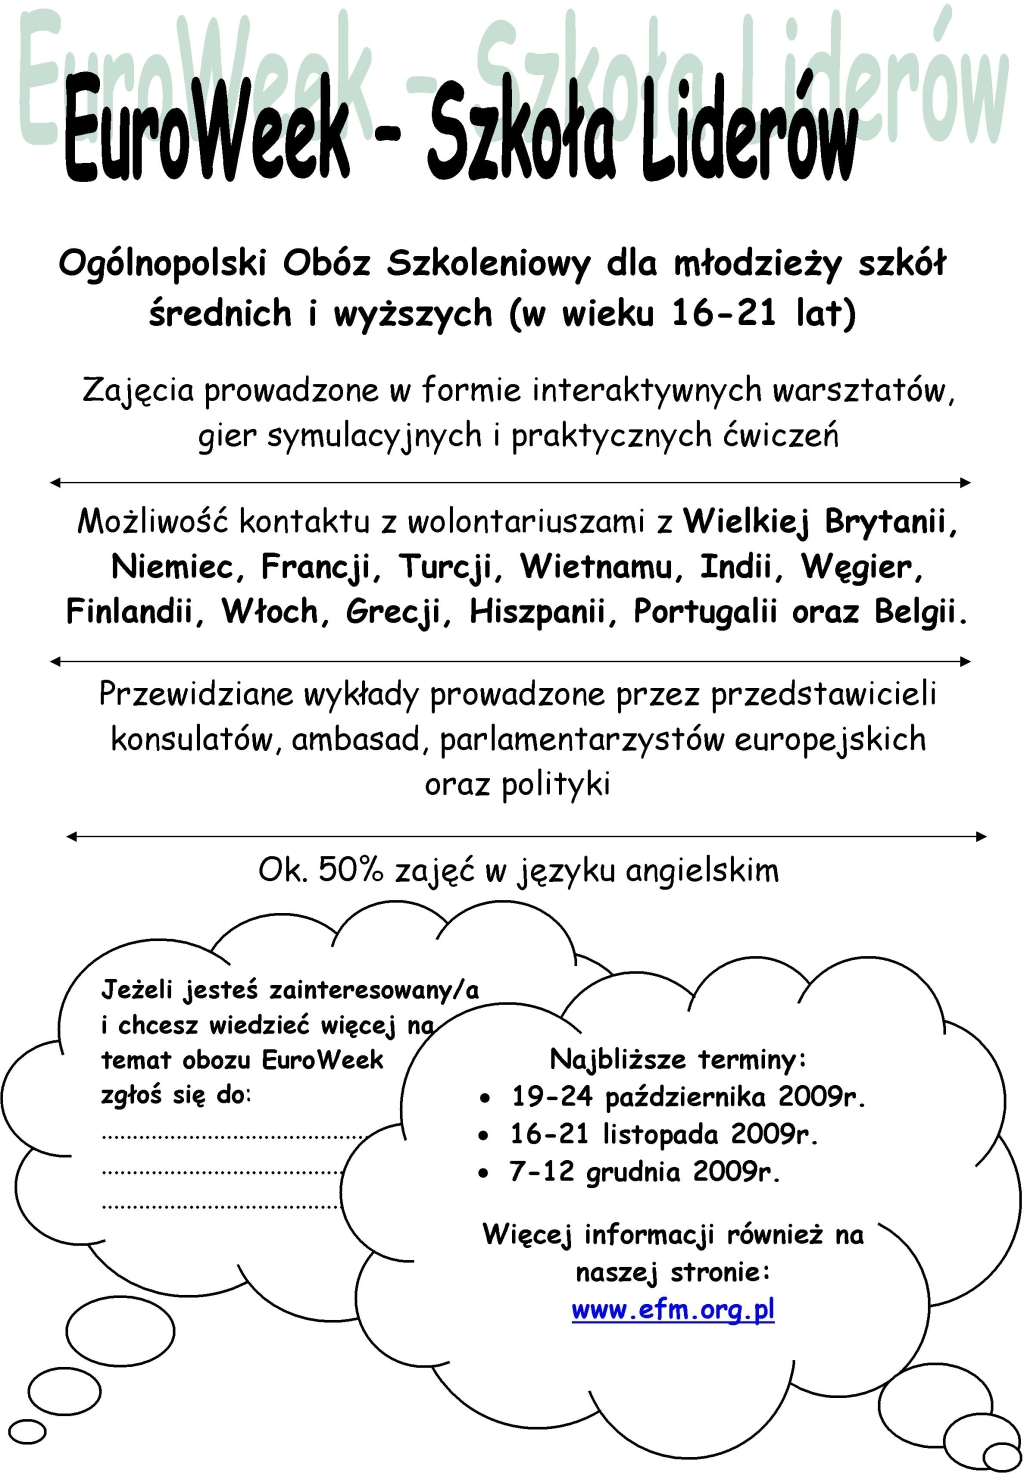 Ogólnopolski Obóz Szkoleniowy_plakat_p01.jpeg